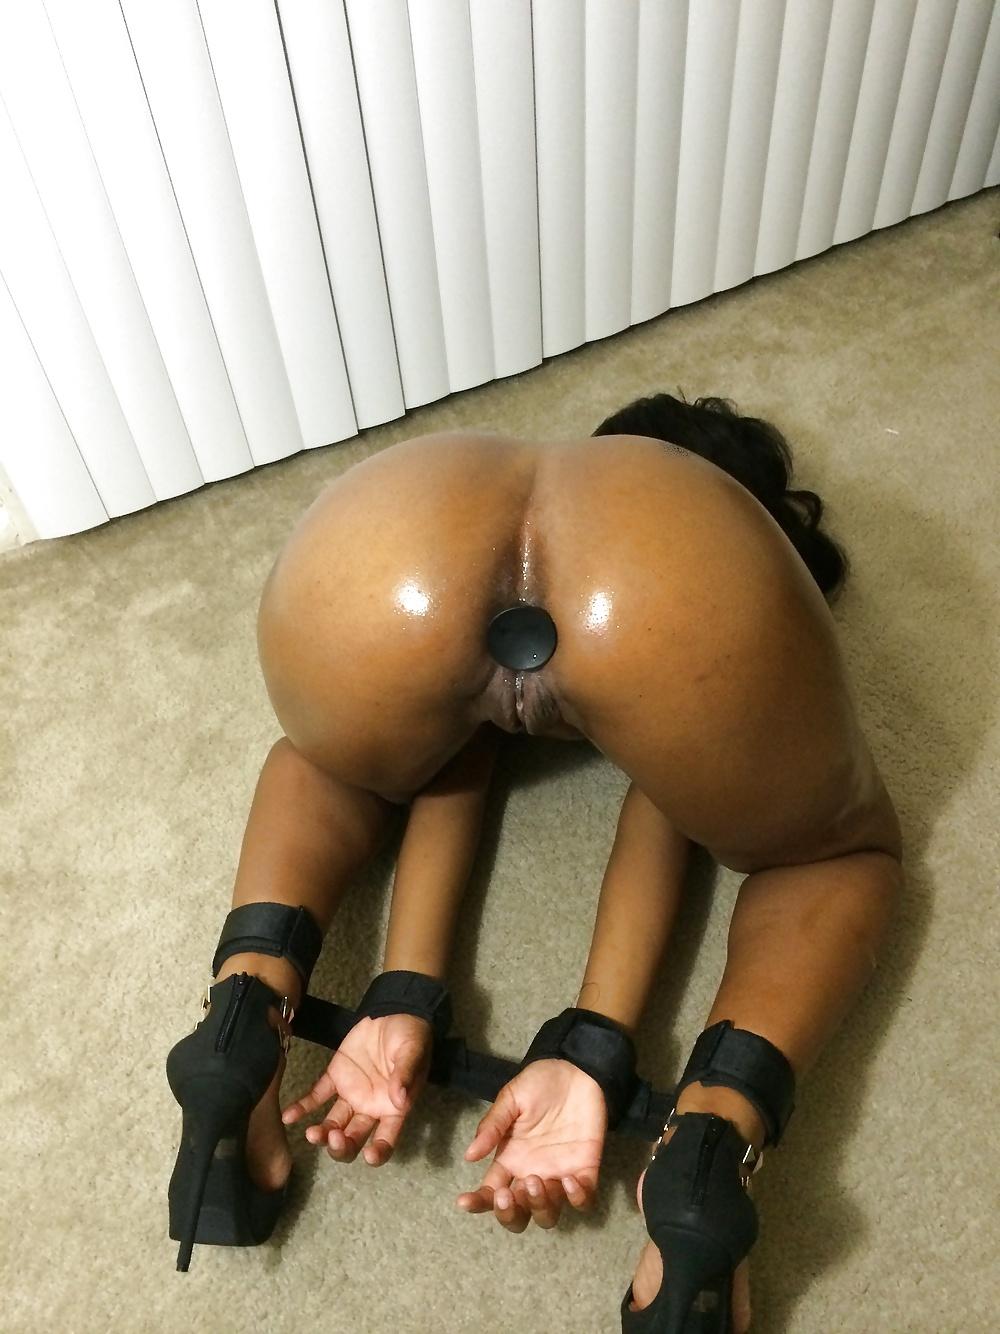 plugs video anal Black